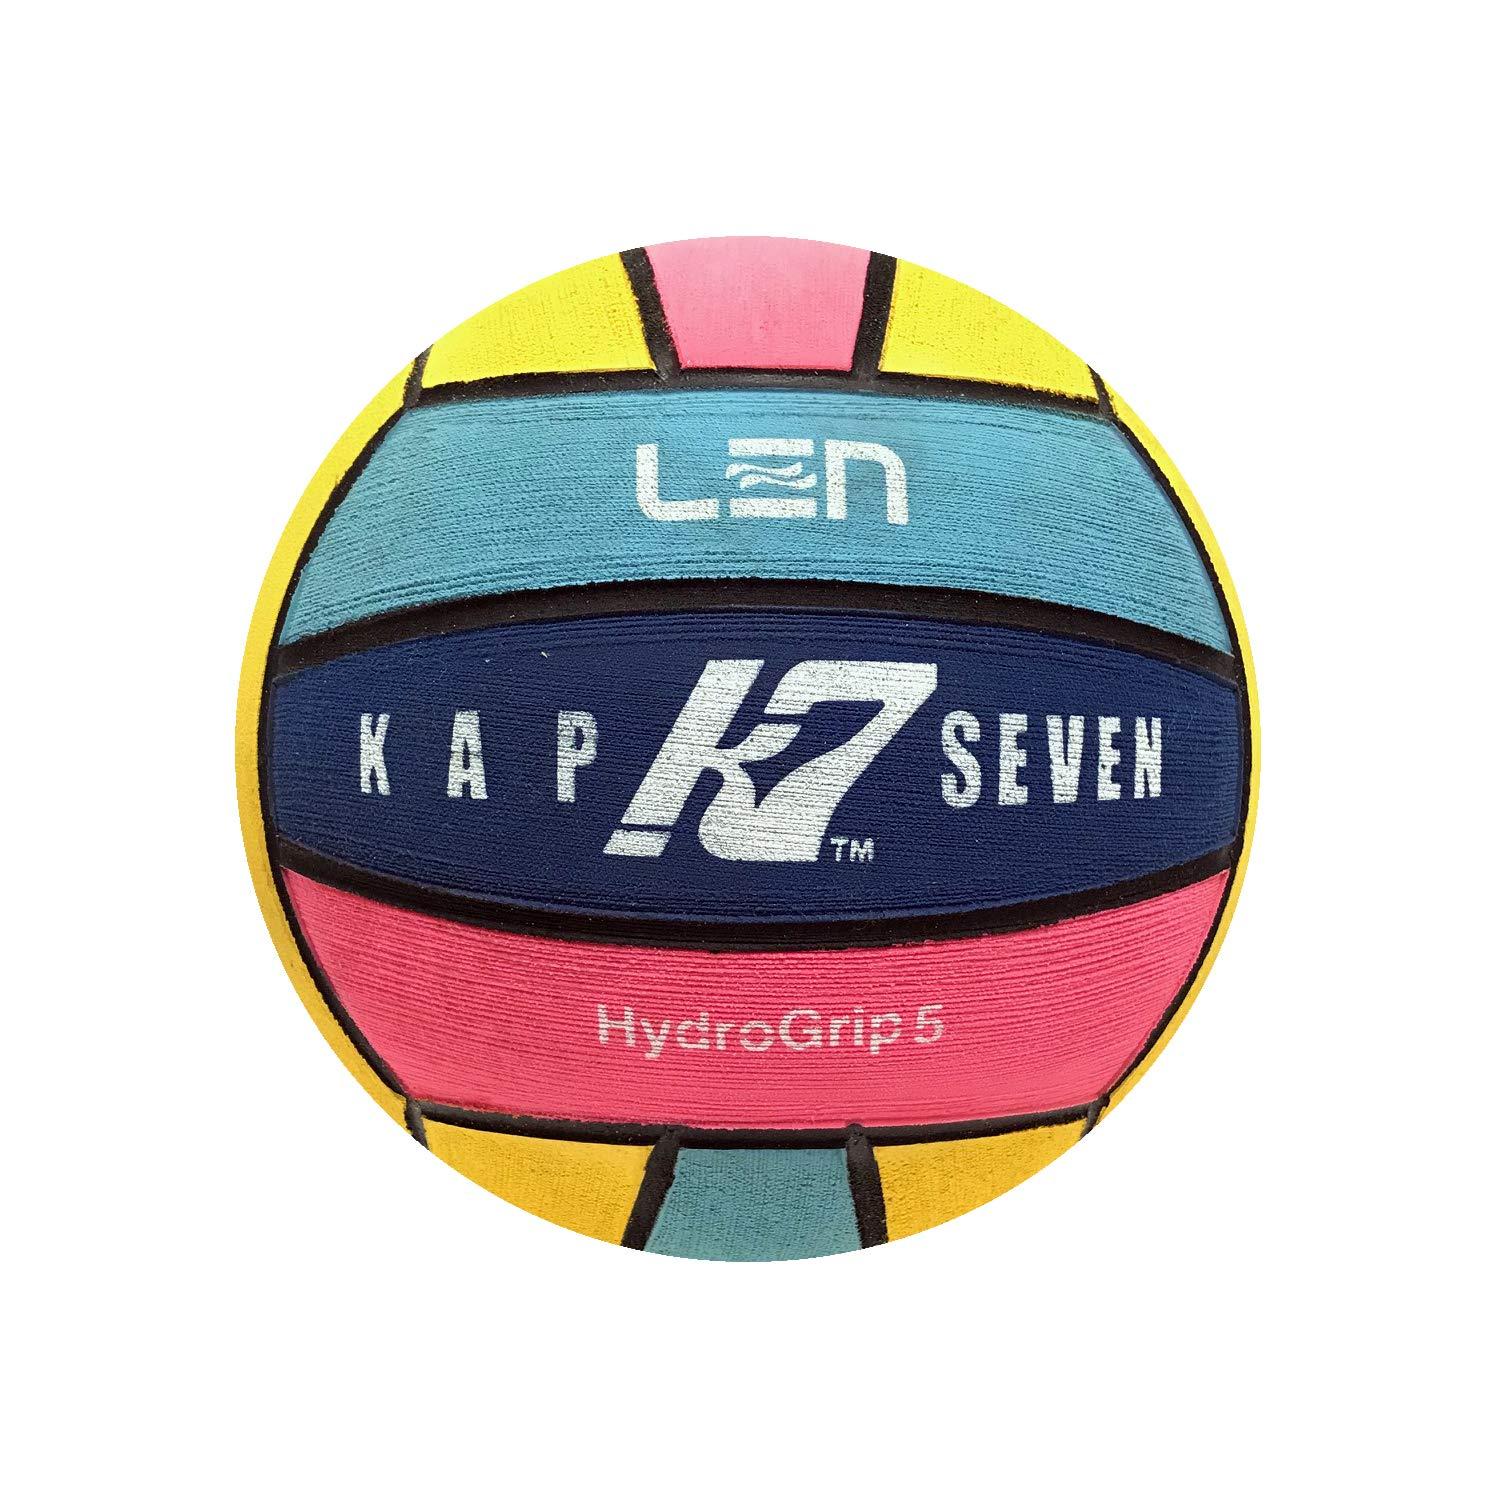 KAP7 Size 5 LEN Euro 2018 Water Polo Ball (Limited Edition) by KAP7